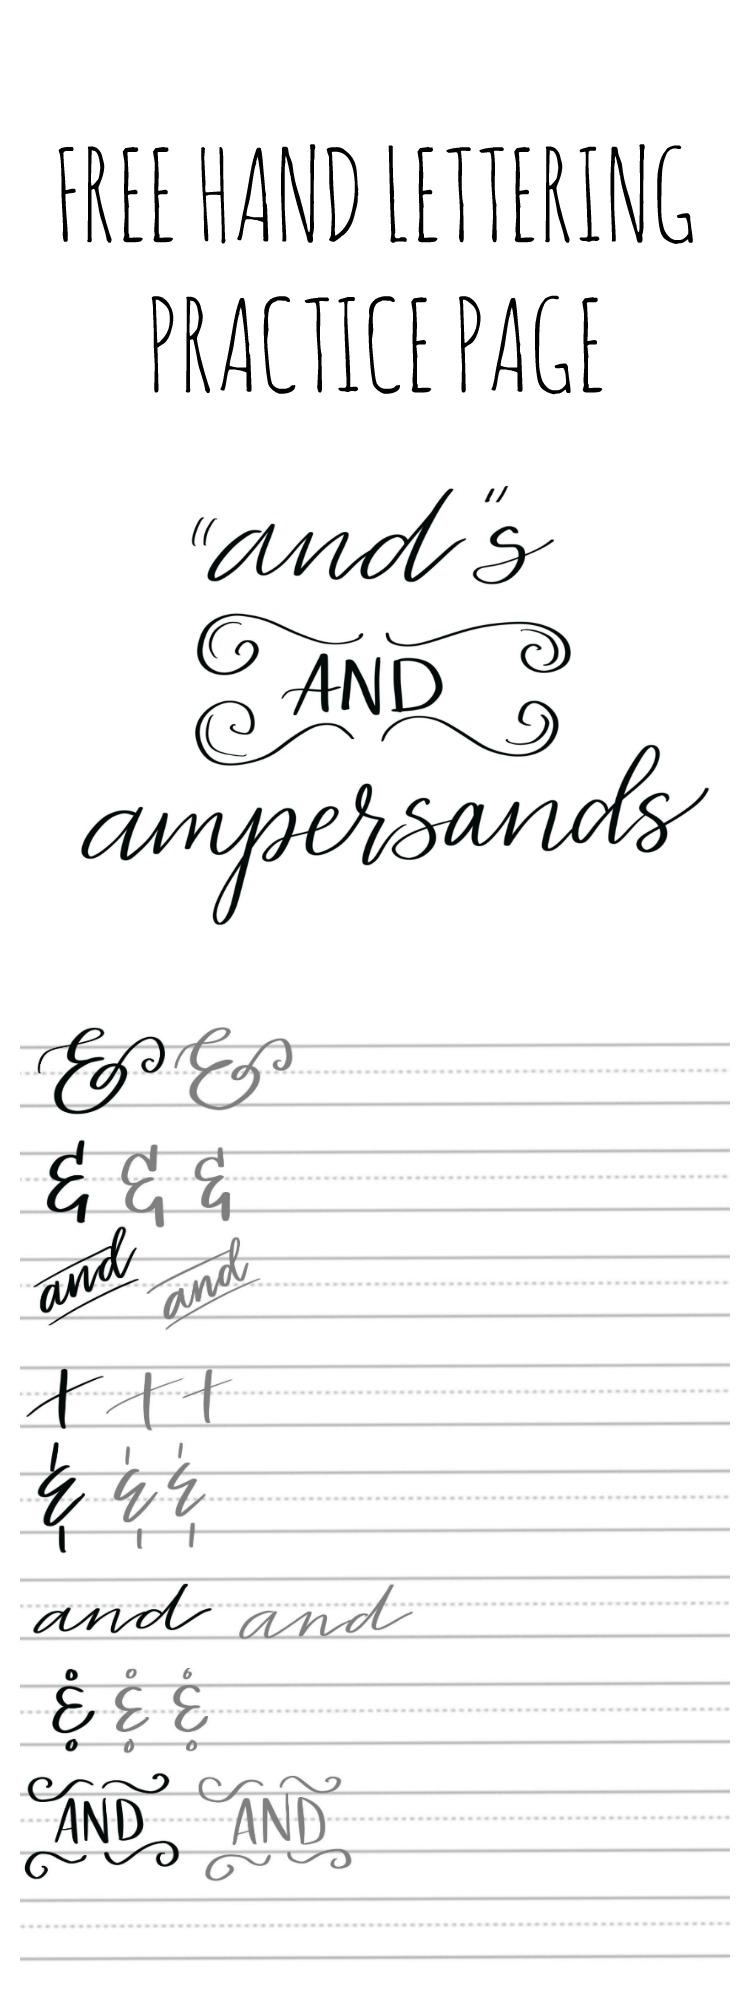 Hand Lettering Practice: Ampersands